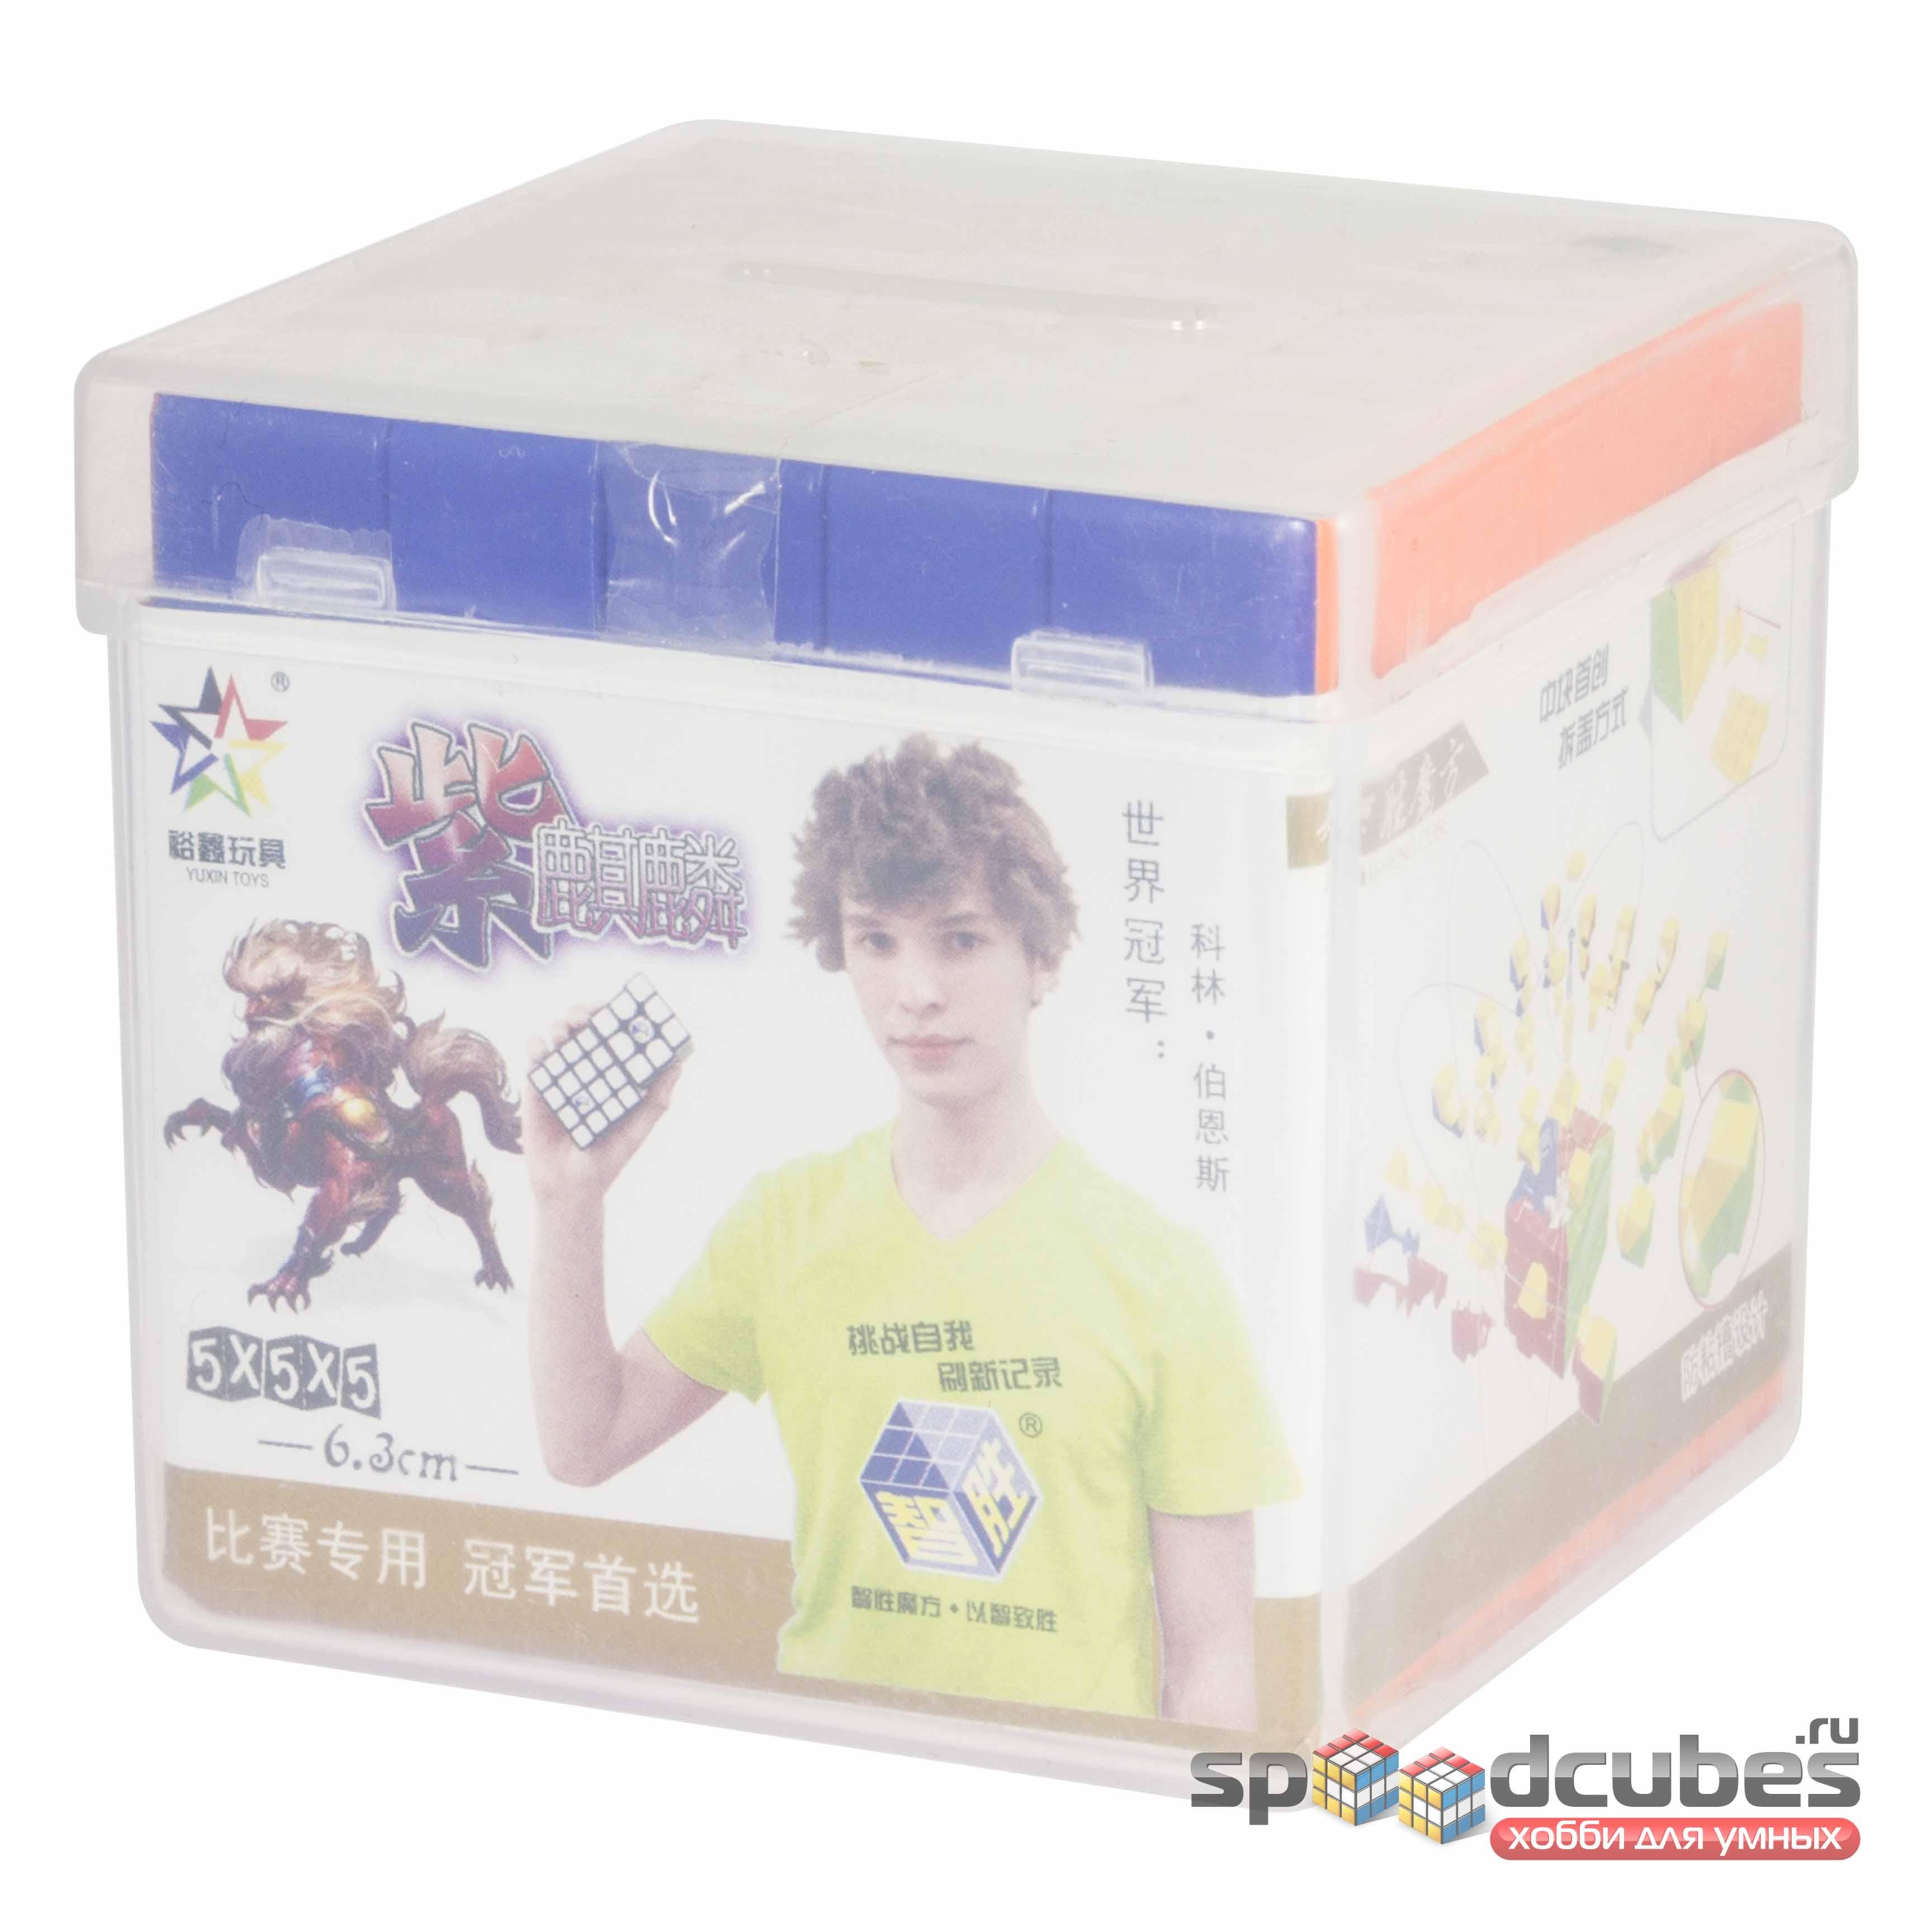 YuXin 5x5x5 (цв) 1